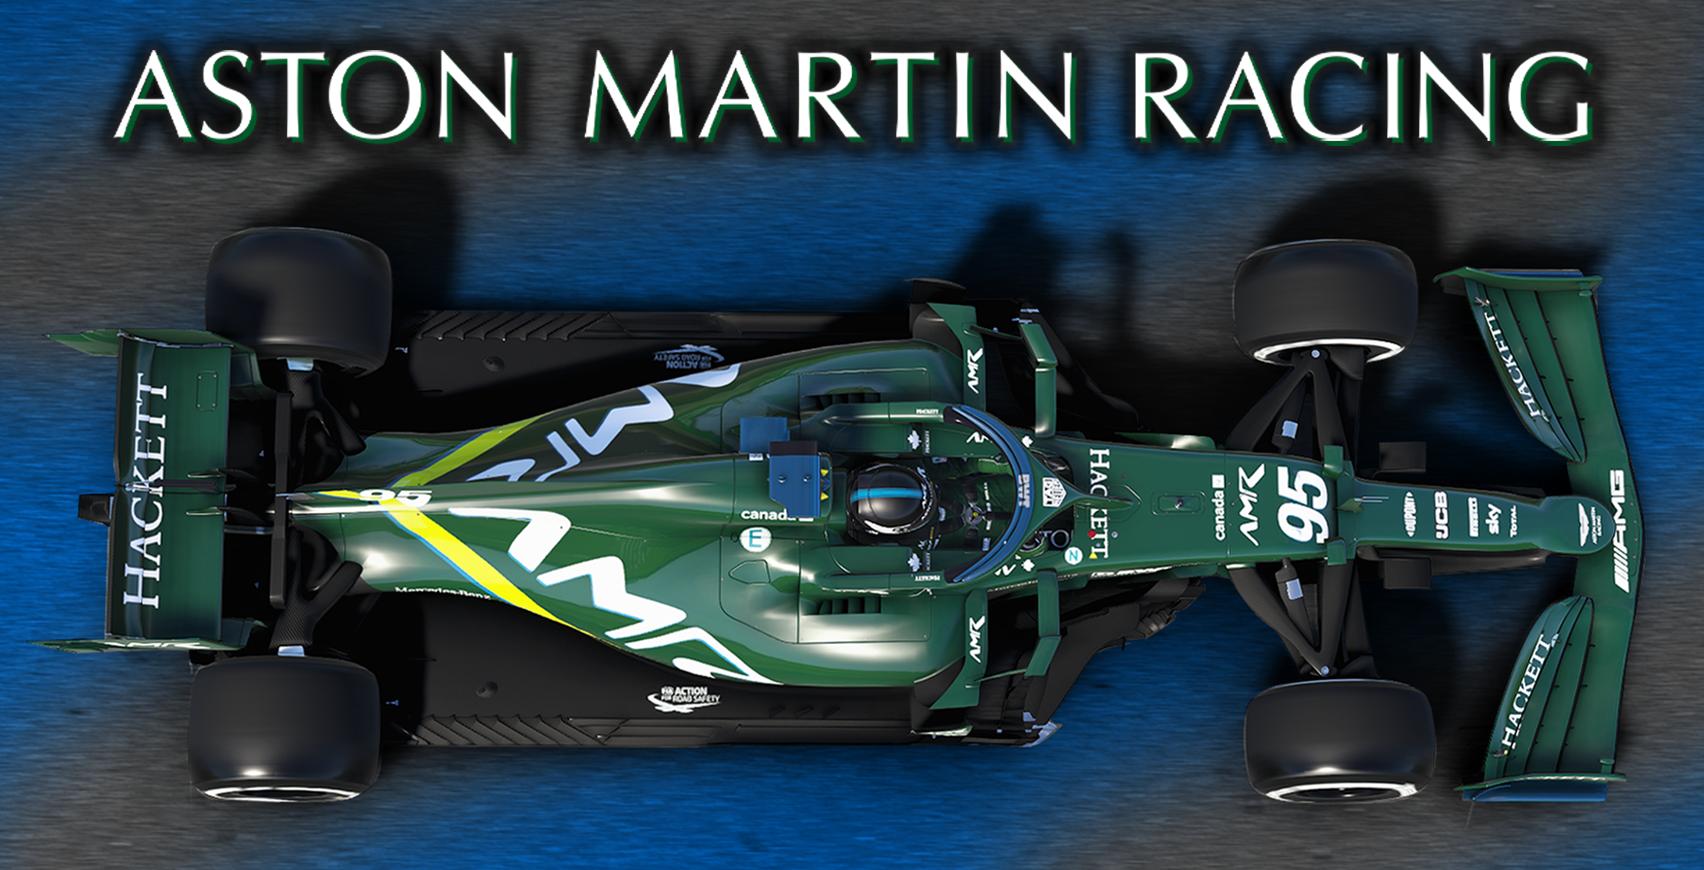 2021 Aston Martin Racing Full Team Mod Package Racedepartment